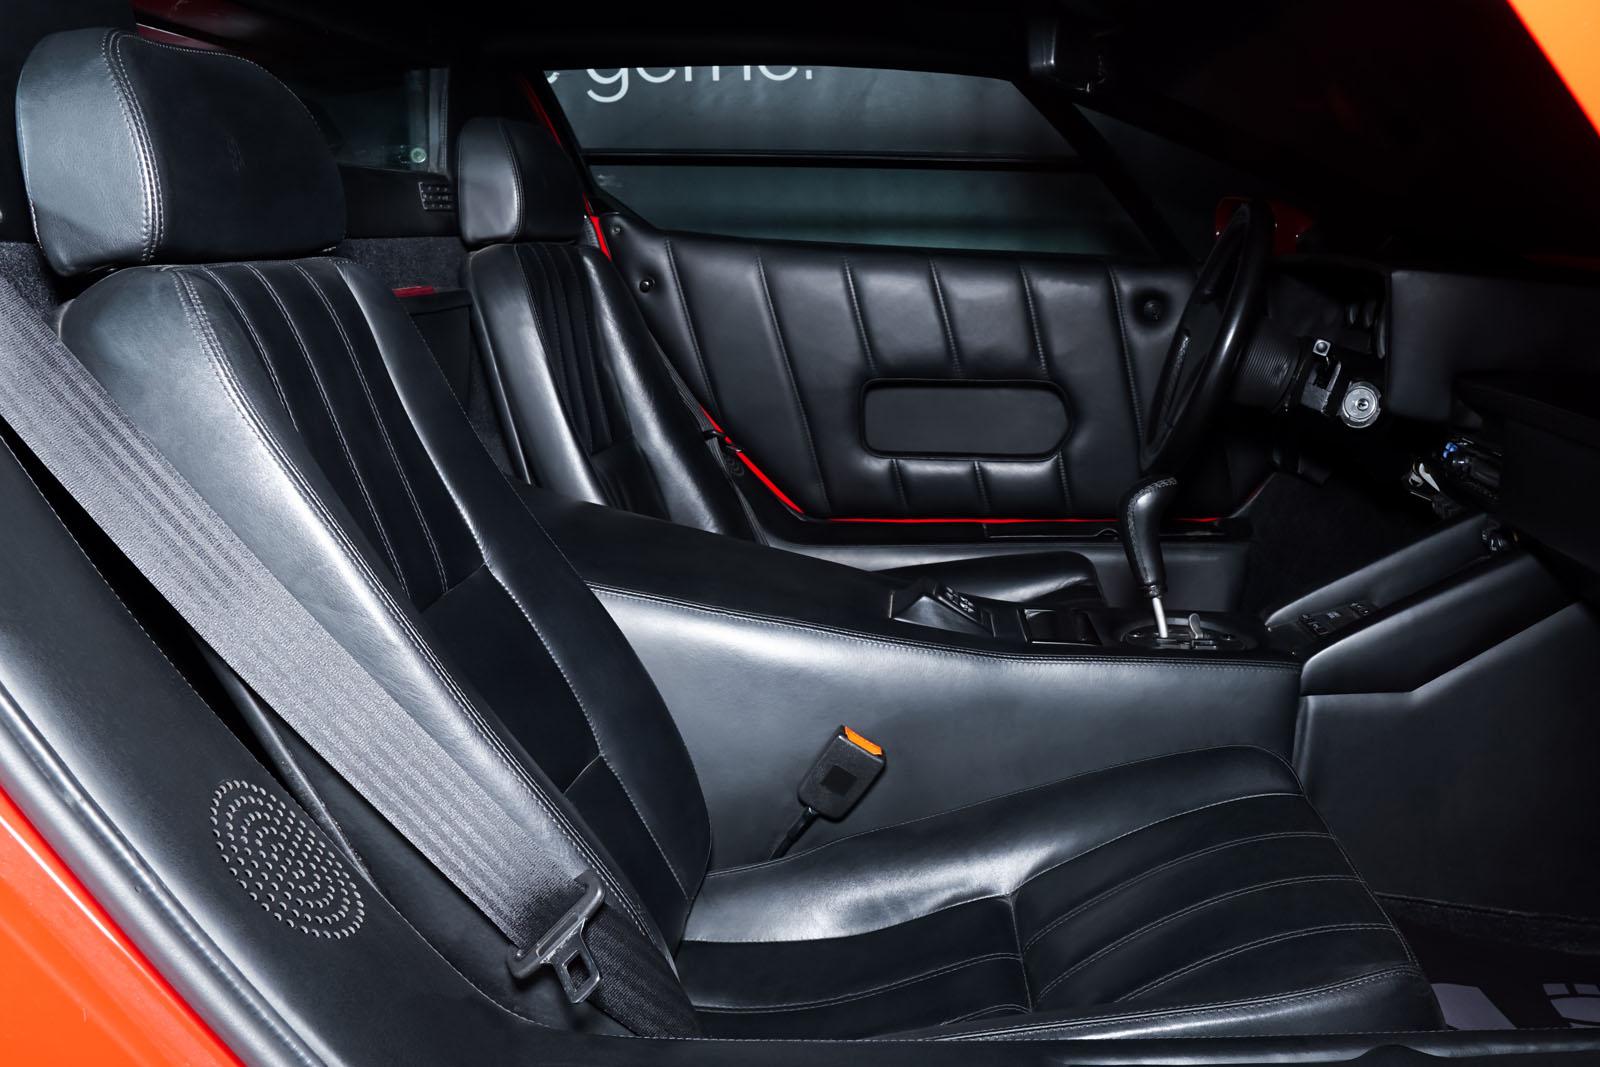 Lamborghini_Countach_Rot_Schwarz_LAM-2811_20_w